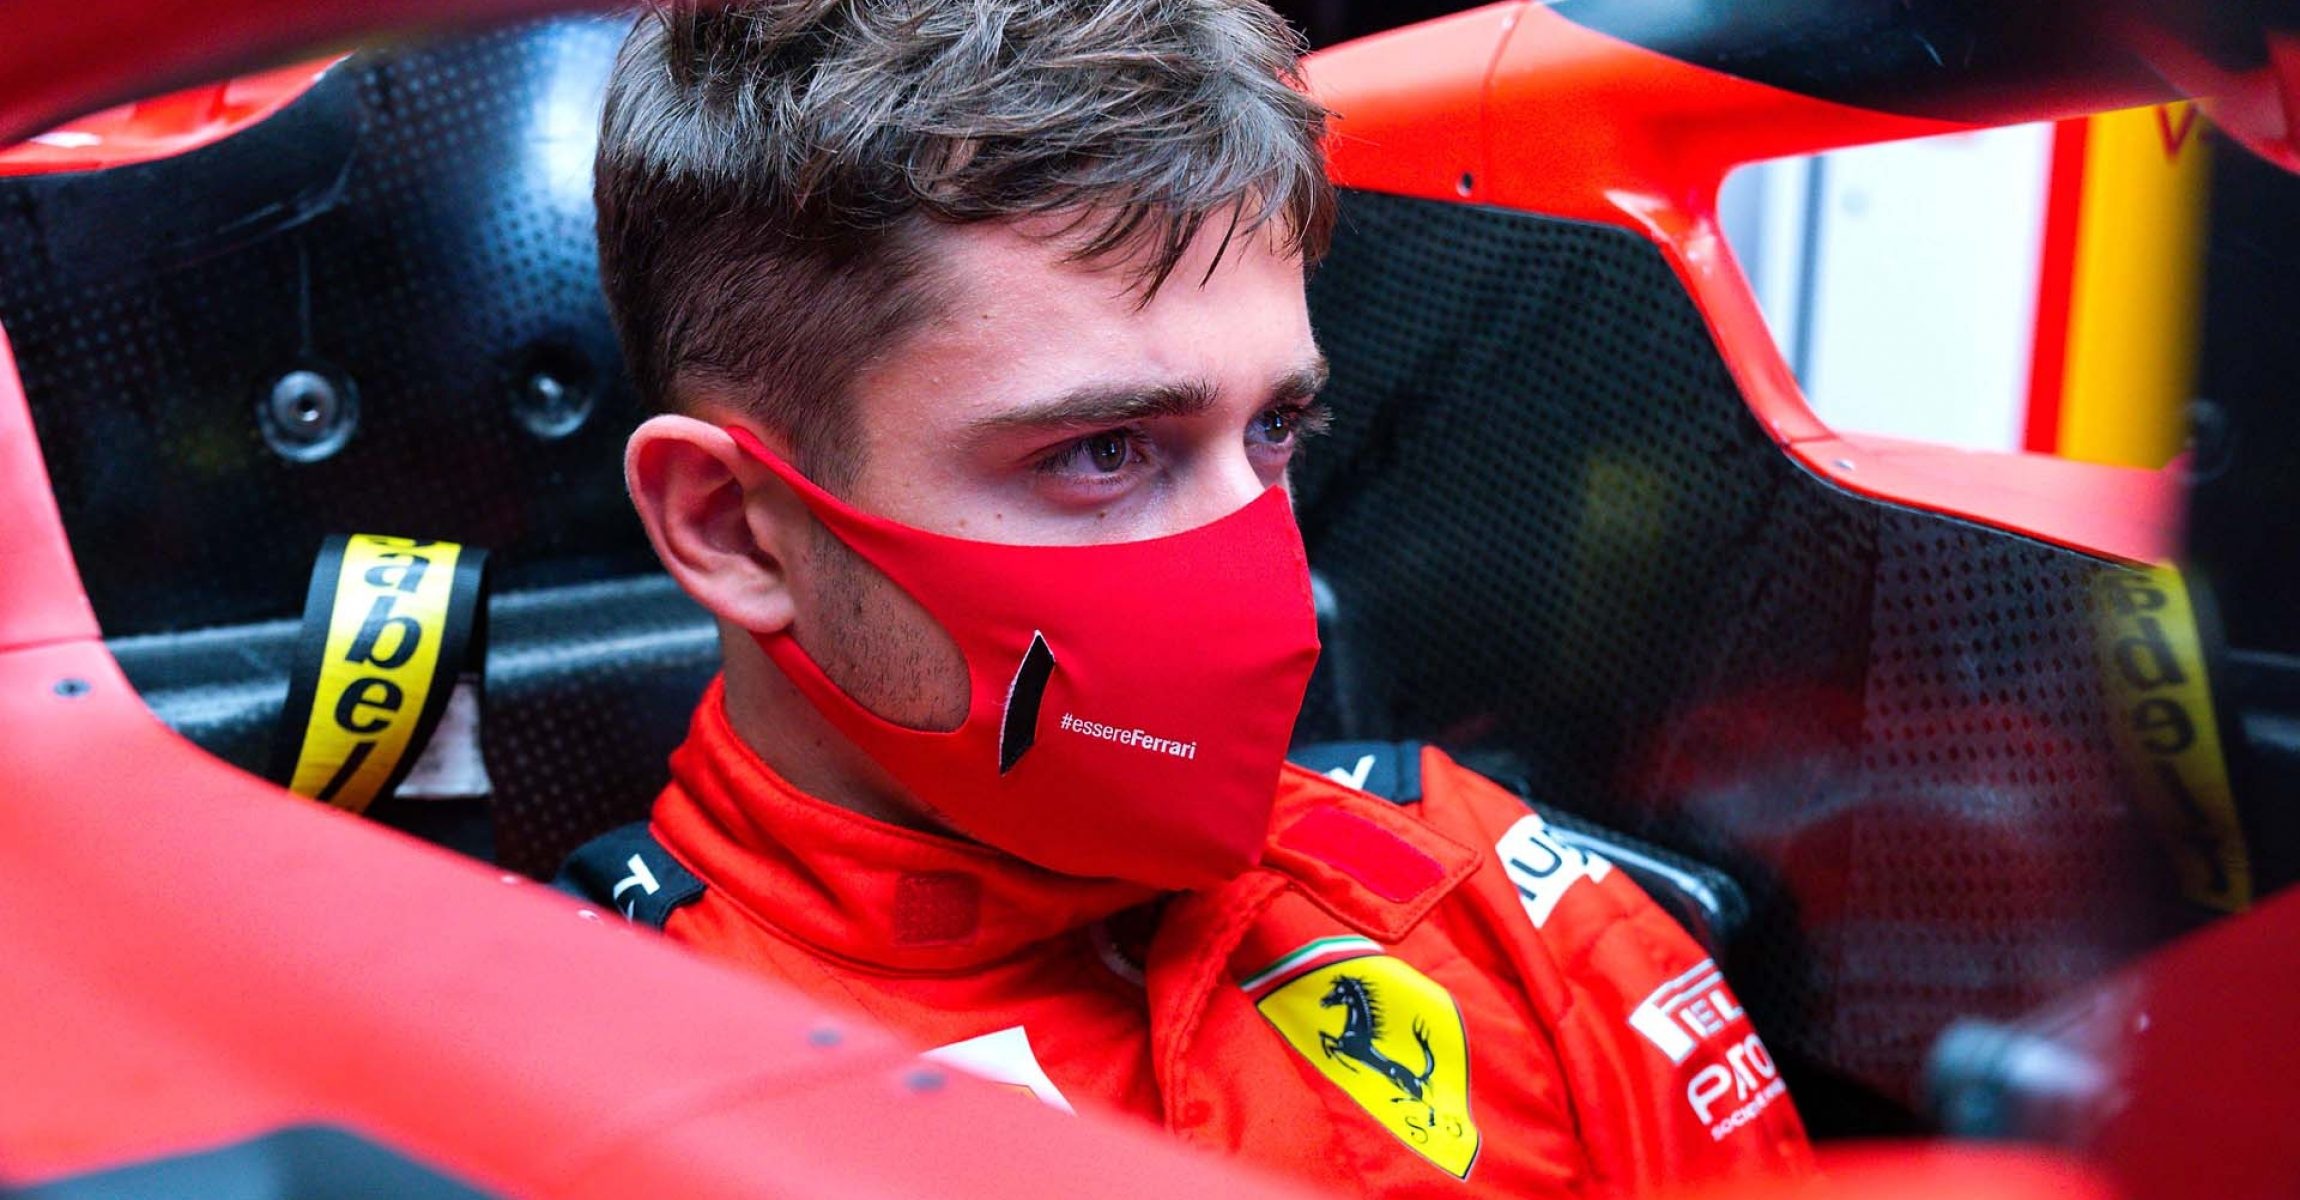 GP SPAGNA F1/2020 -  GIOVEDÌ 13/08/2020  09/08/2020  credit: @Scuderia Ferrari Press Office Charles Leclerc